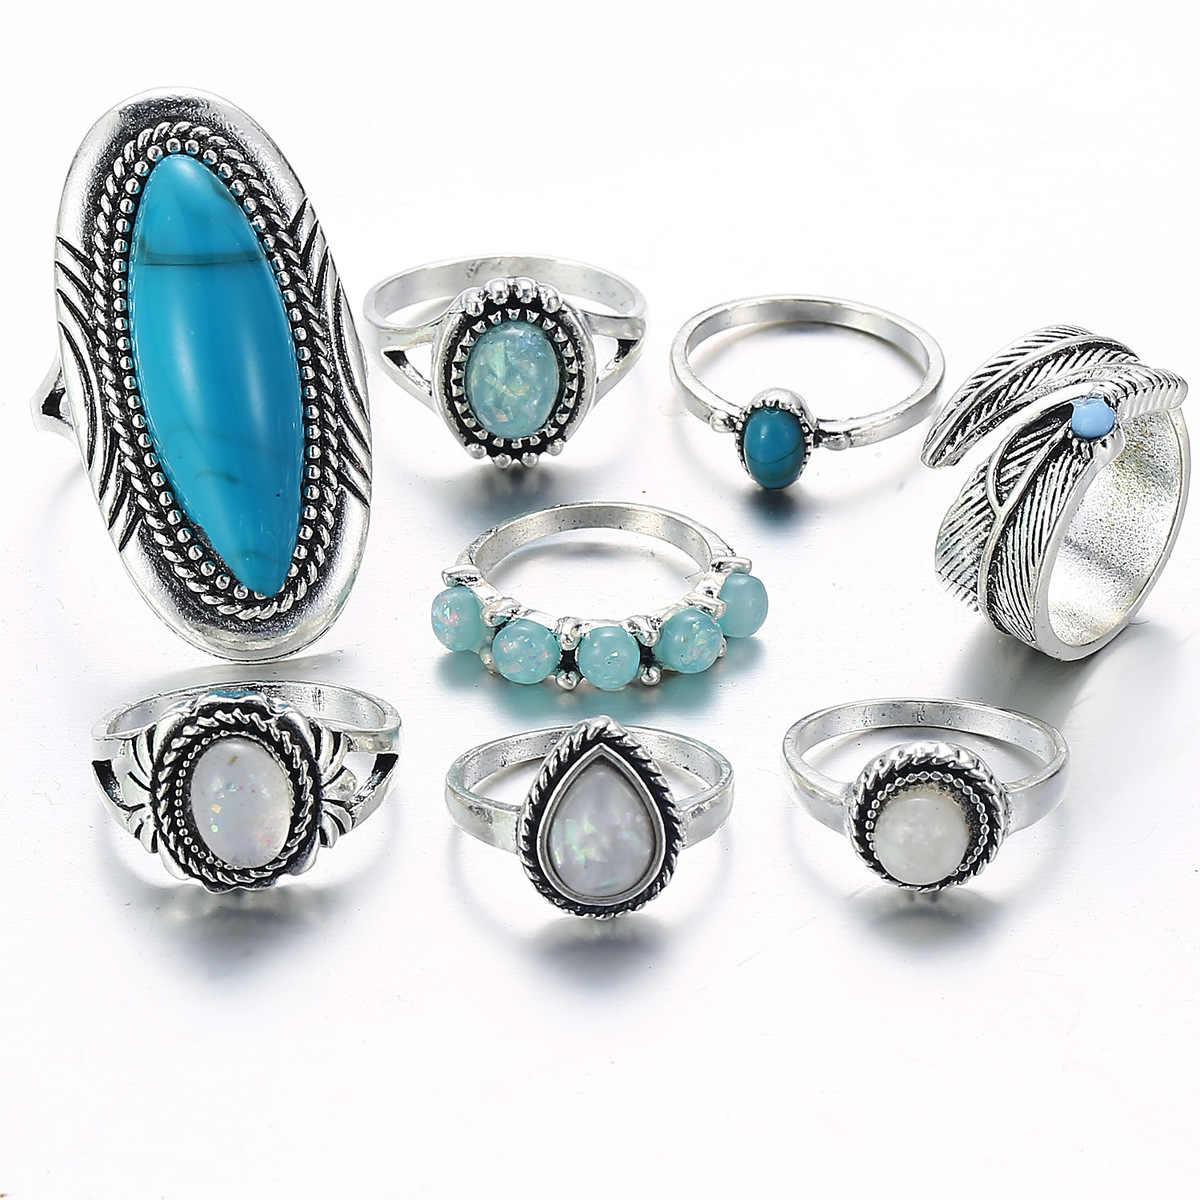 JQUEEN 8 ชิ้น/เซ็ต VINTAGE โบฮีเมียเงิน Turquoises แหวน Knuckle ชุดผู้หญิงเรขาคณิตโอปอล MIDI แหวน